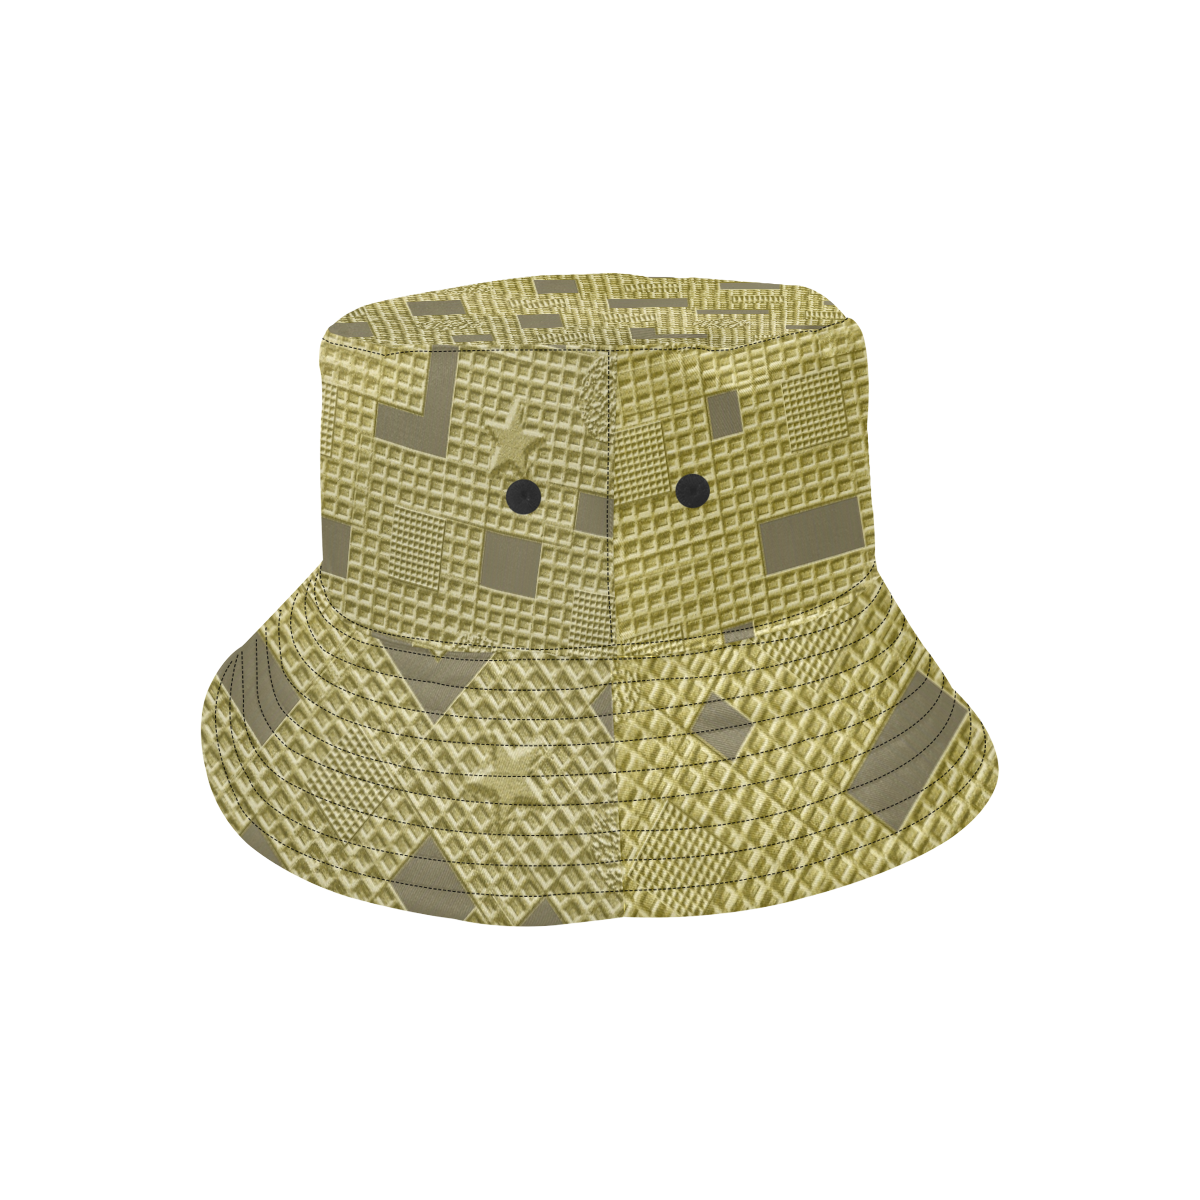 GOLD GEOMETRY LADYLIKE All Over Print Bucket Hat